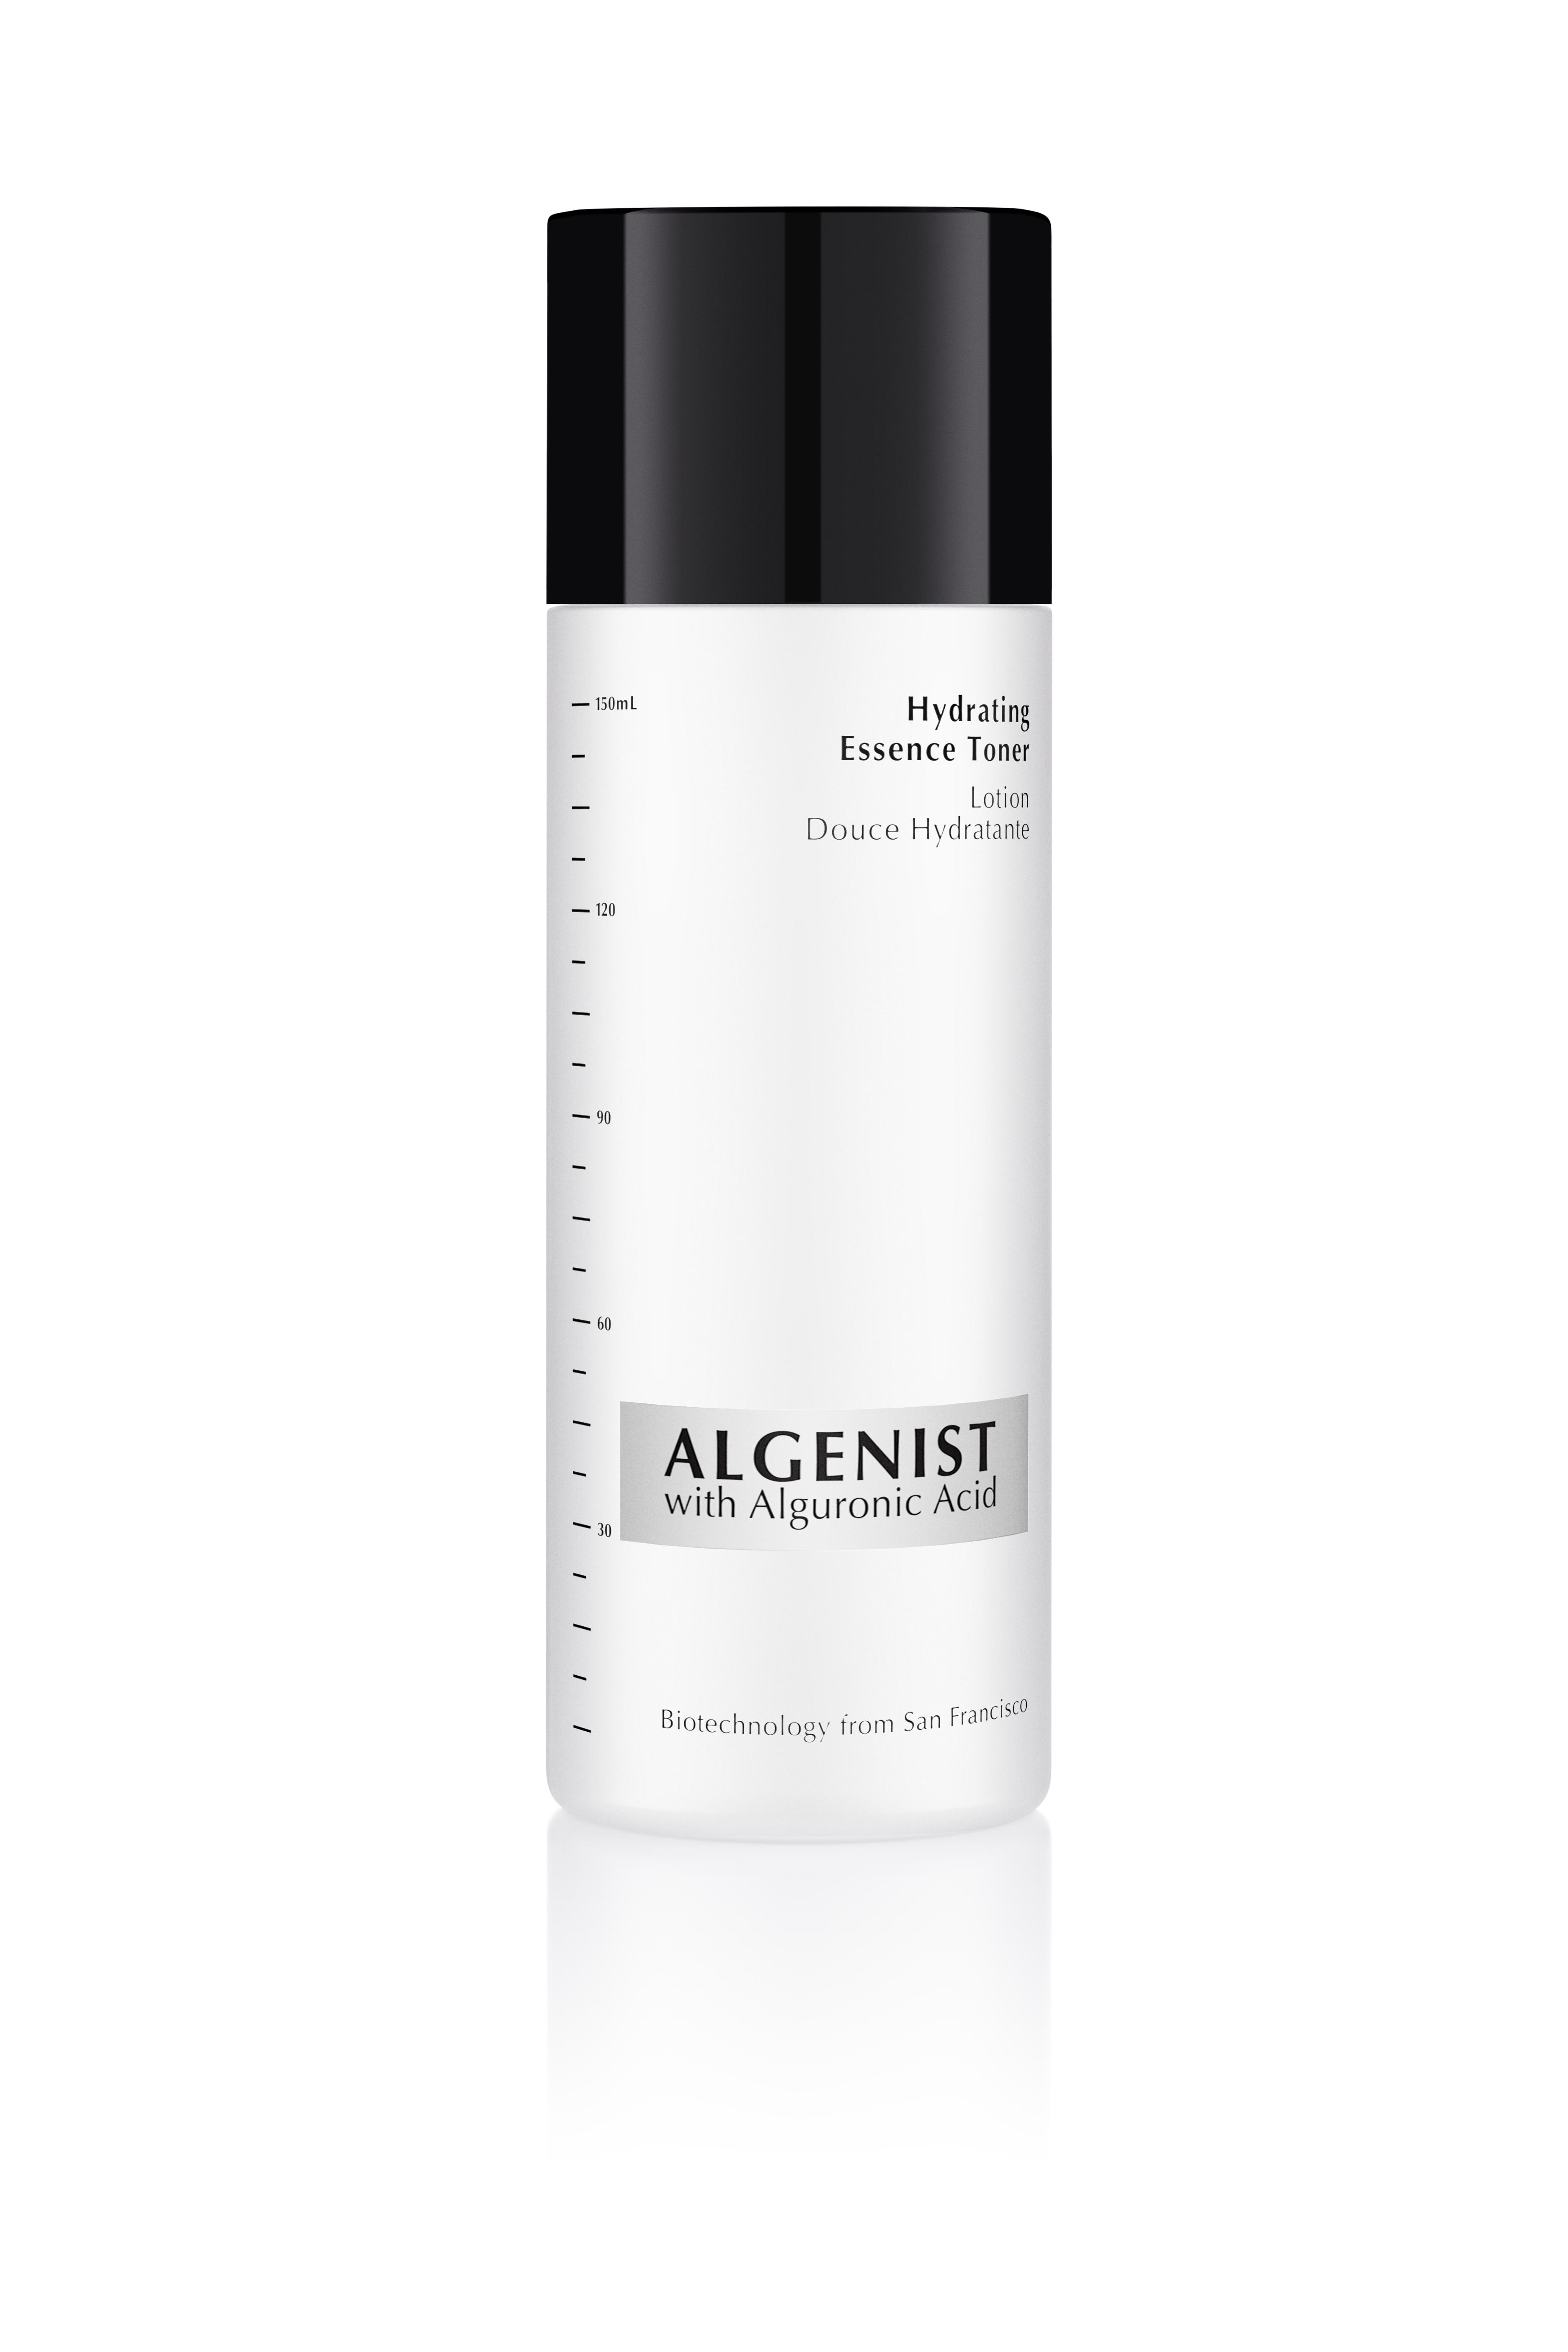 Algenist Hydrating Essence Toner, 150 ml